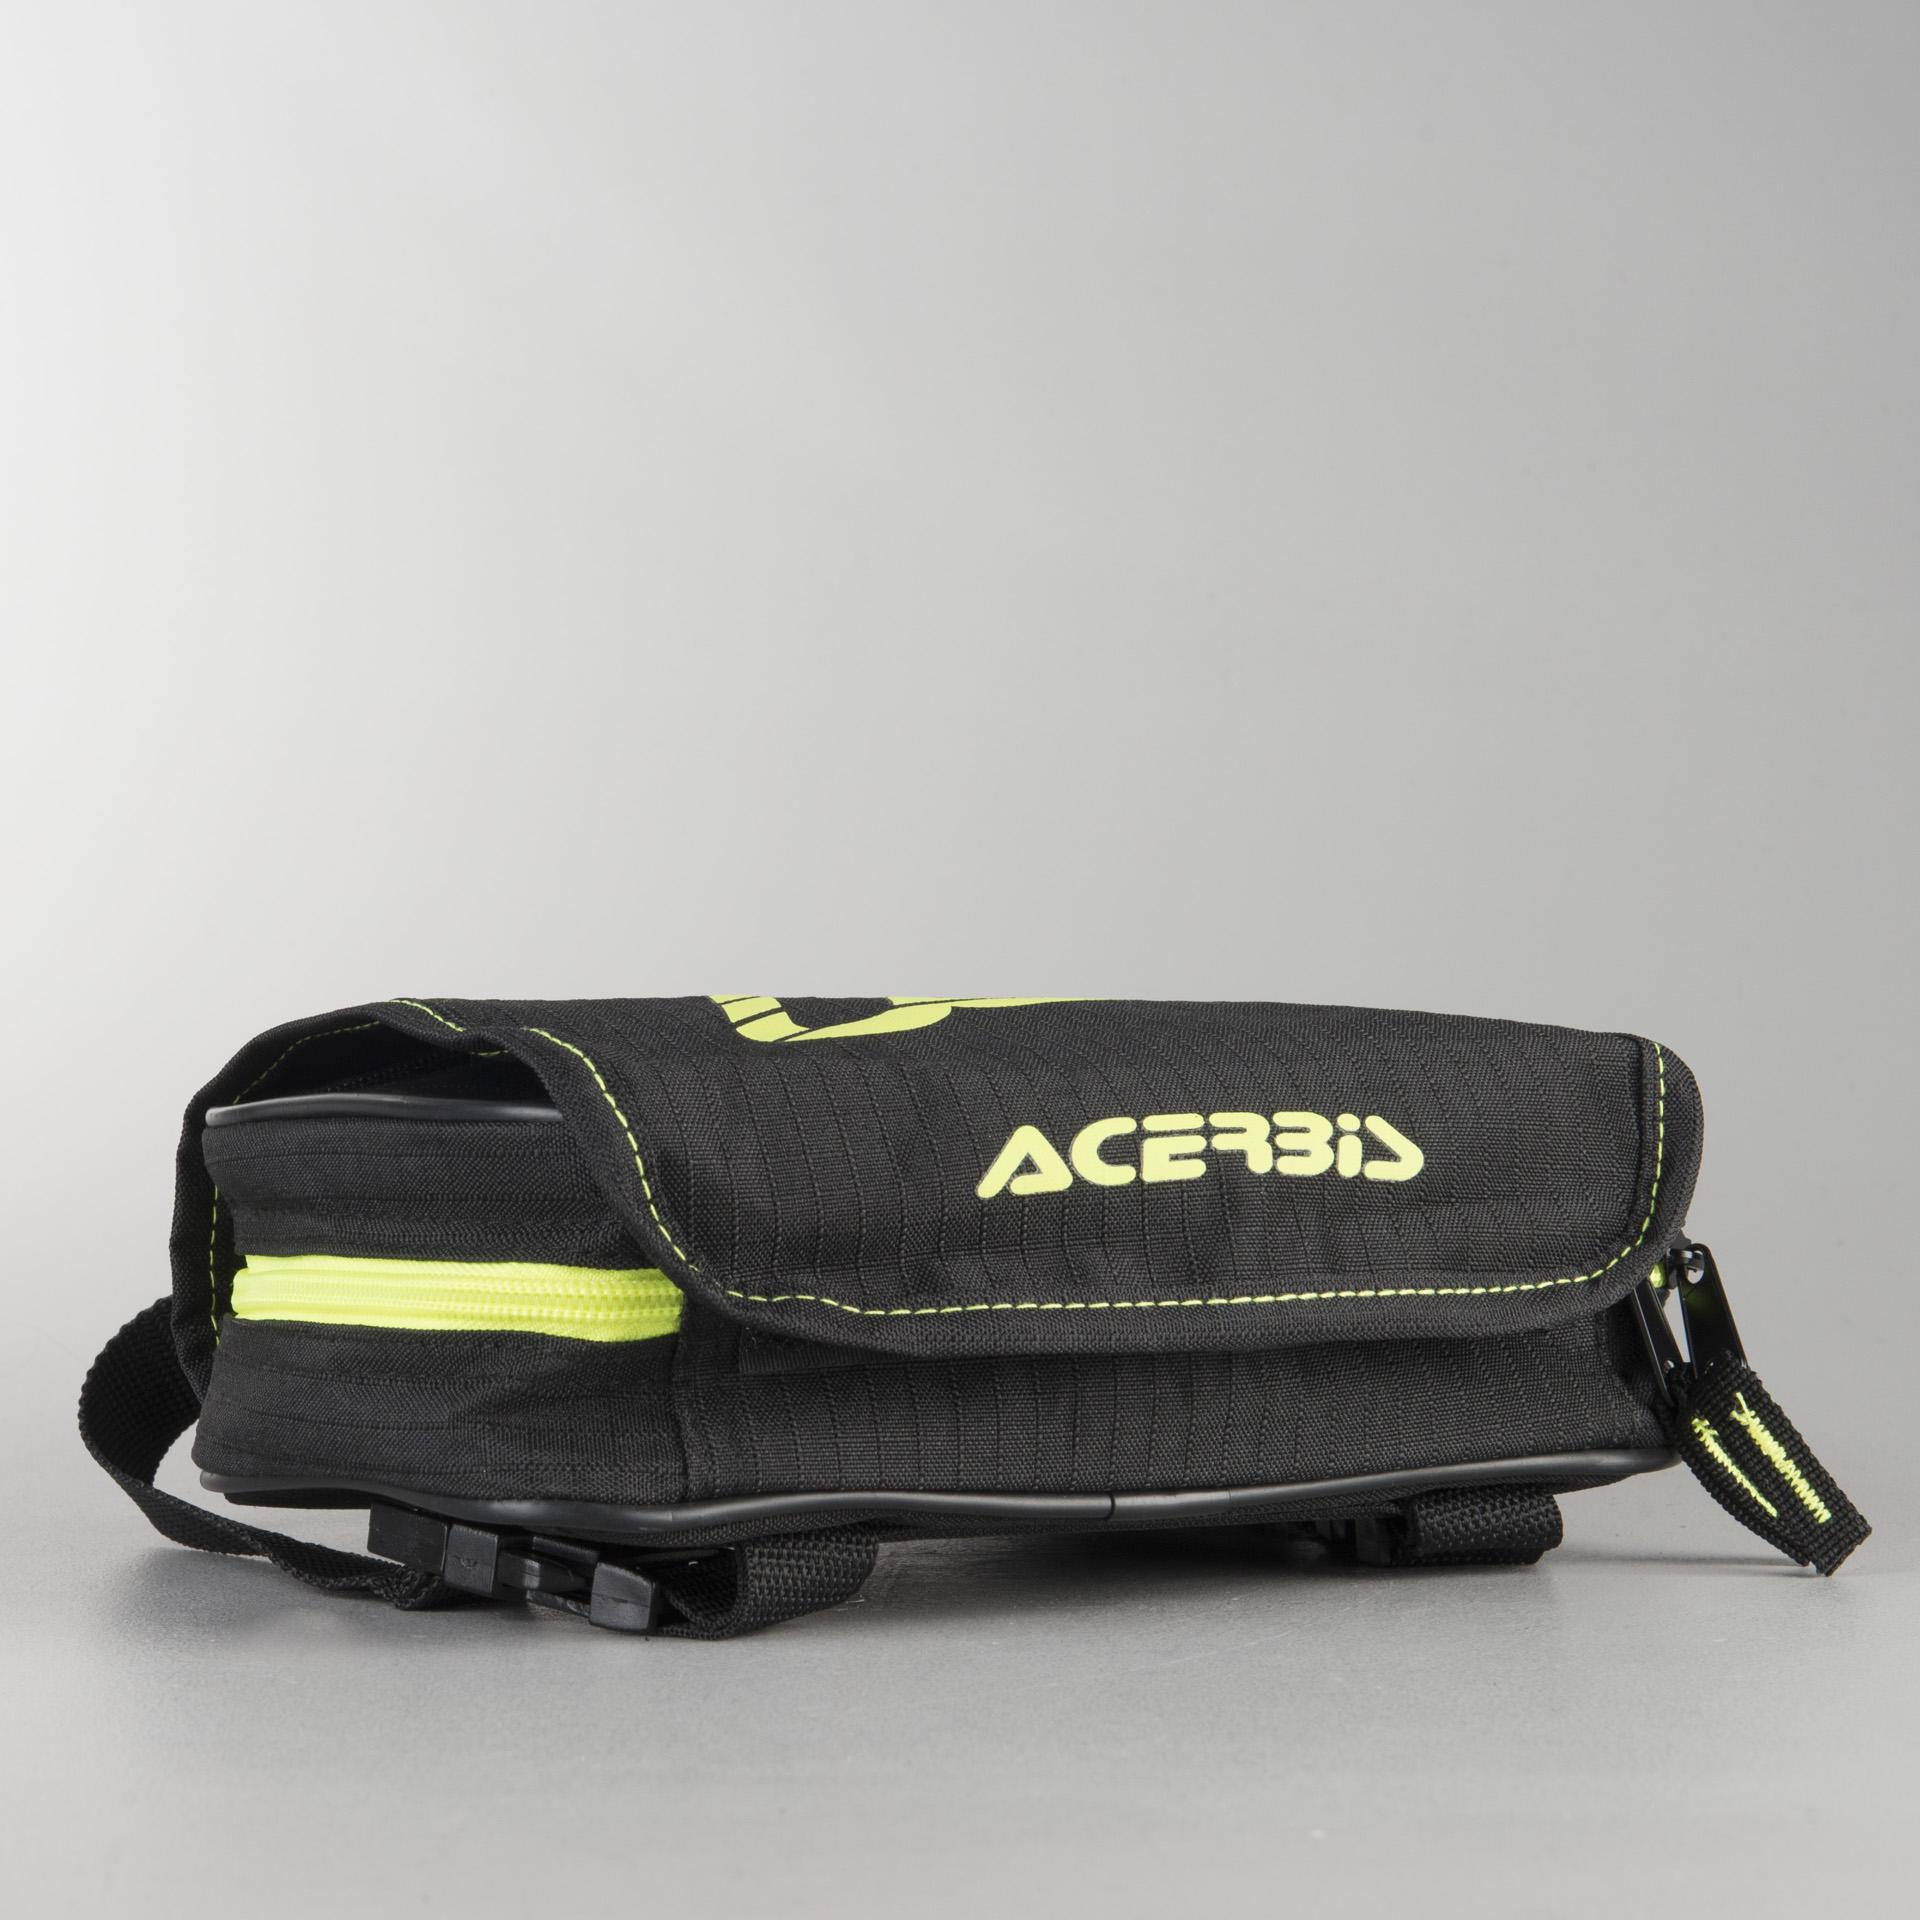 Acerbis Front Fender Tool Bag Now